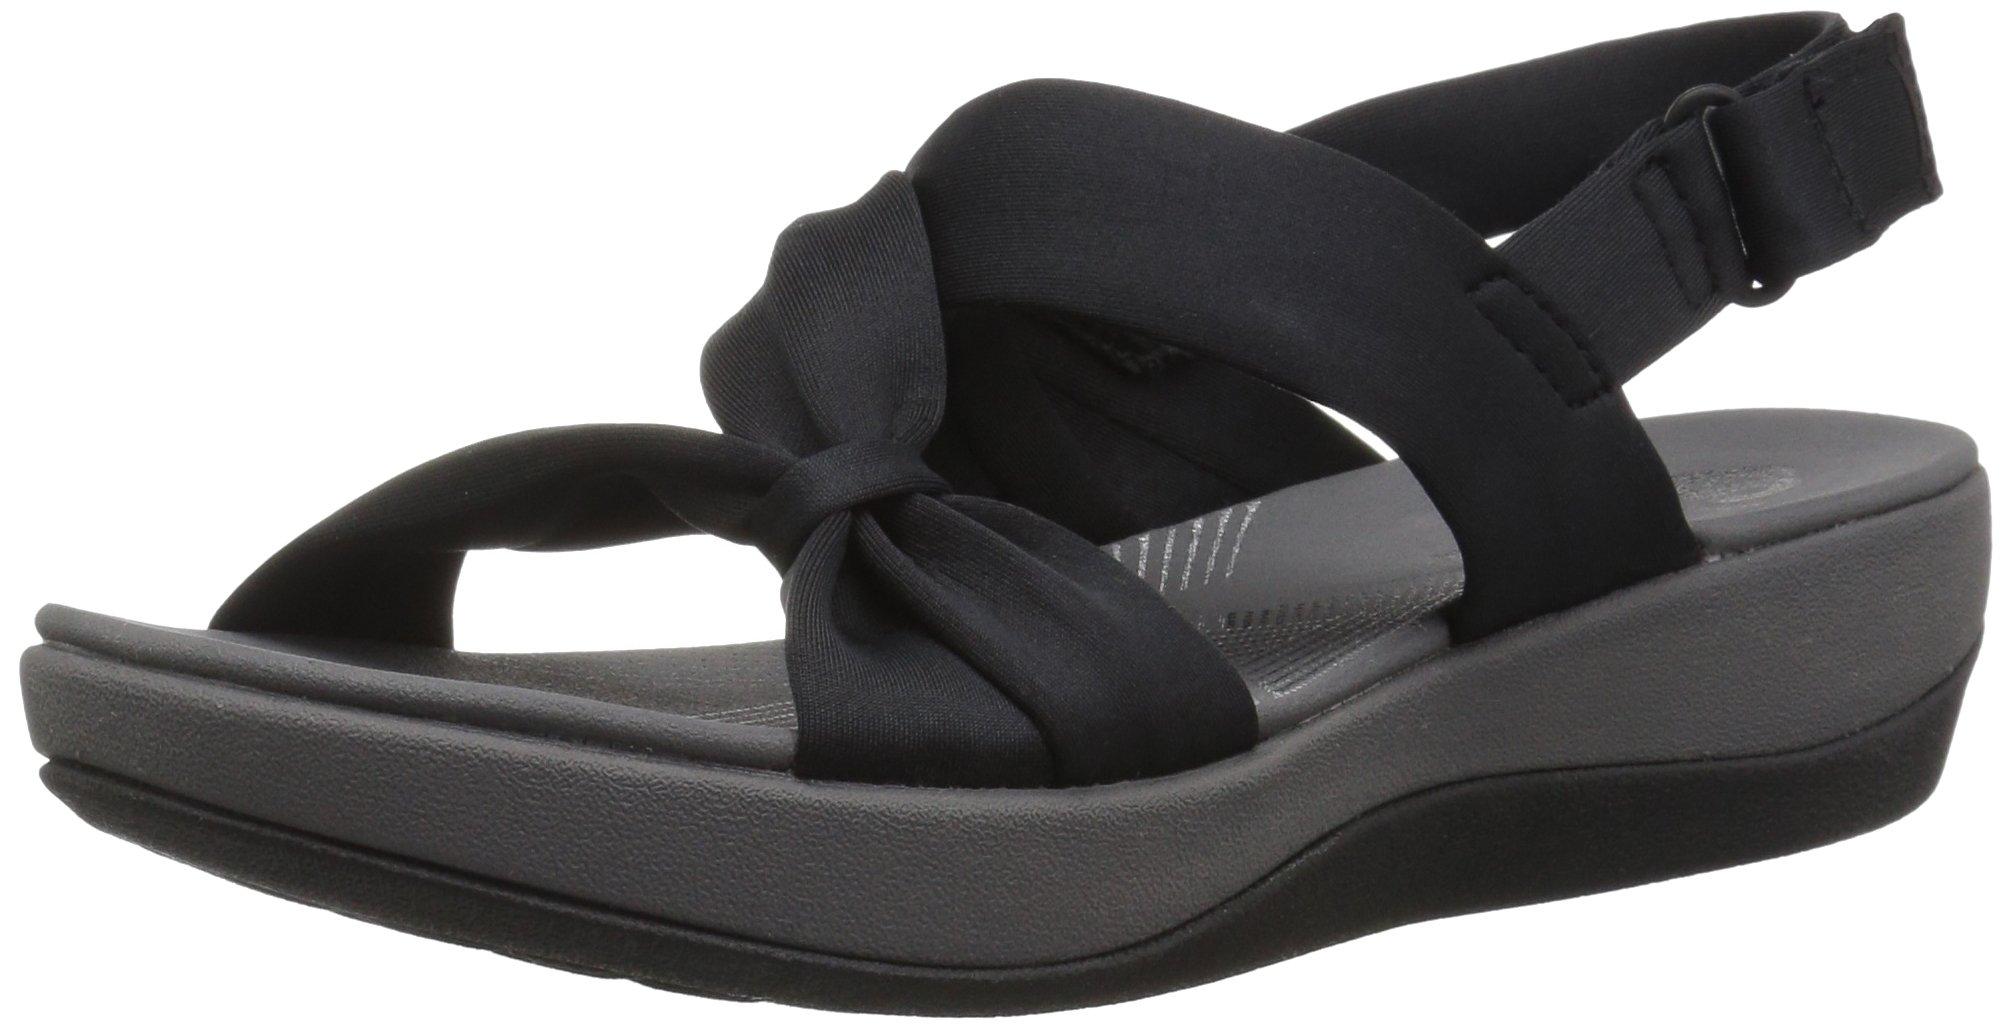 CLARKS Women's Arla Primrose Sandal, Black Fabric, 8 Medium US by CLARKS